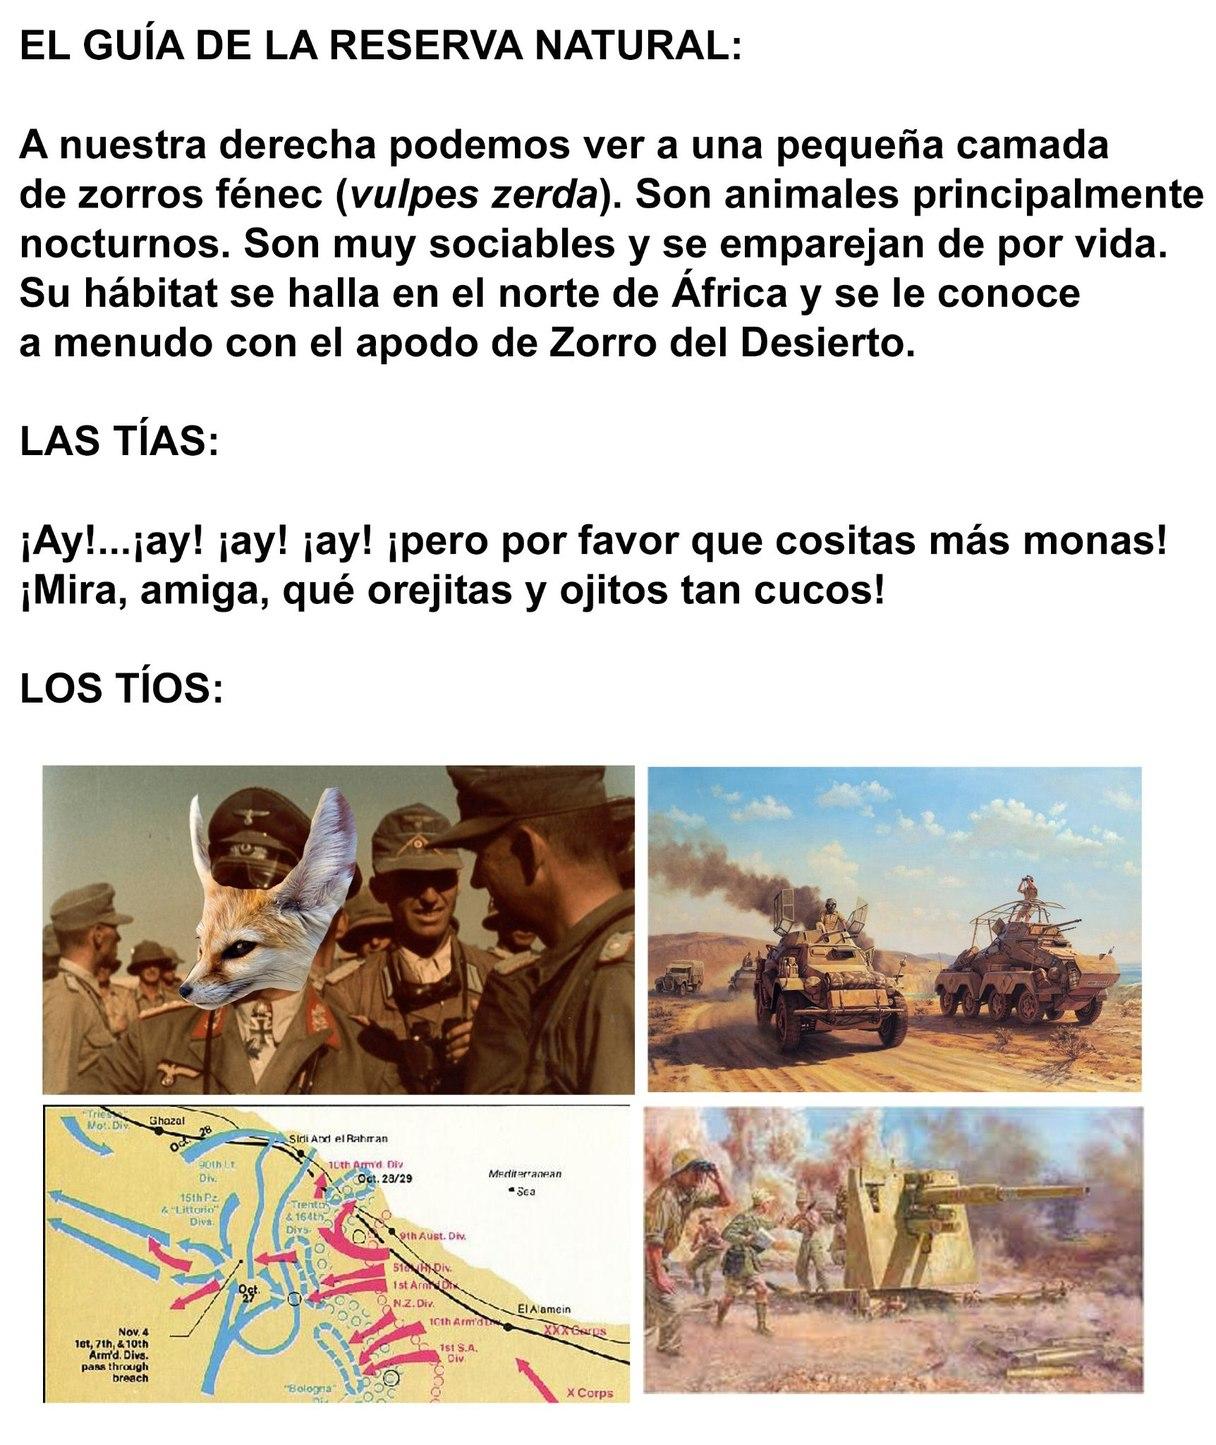 Zorro del Desierto - meme